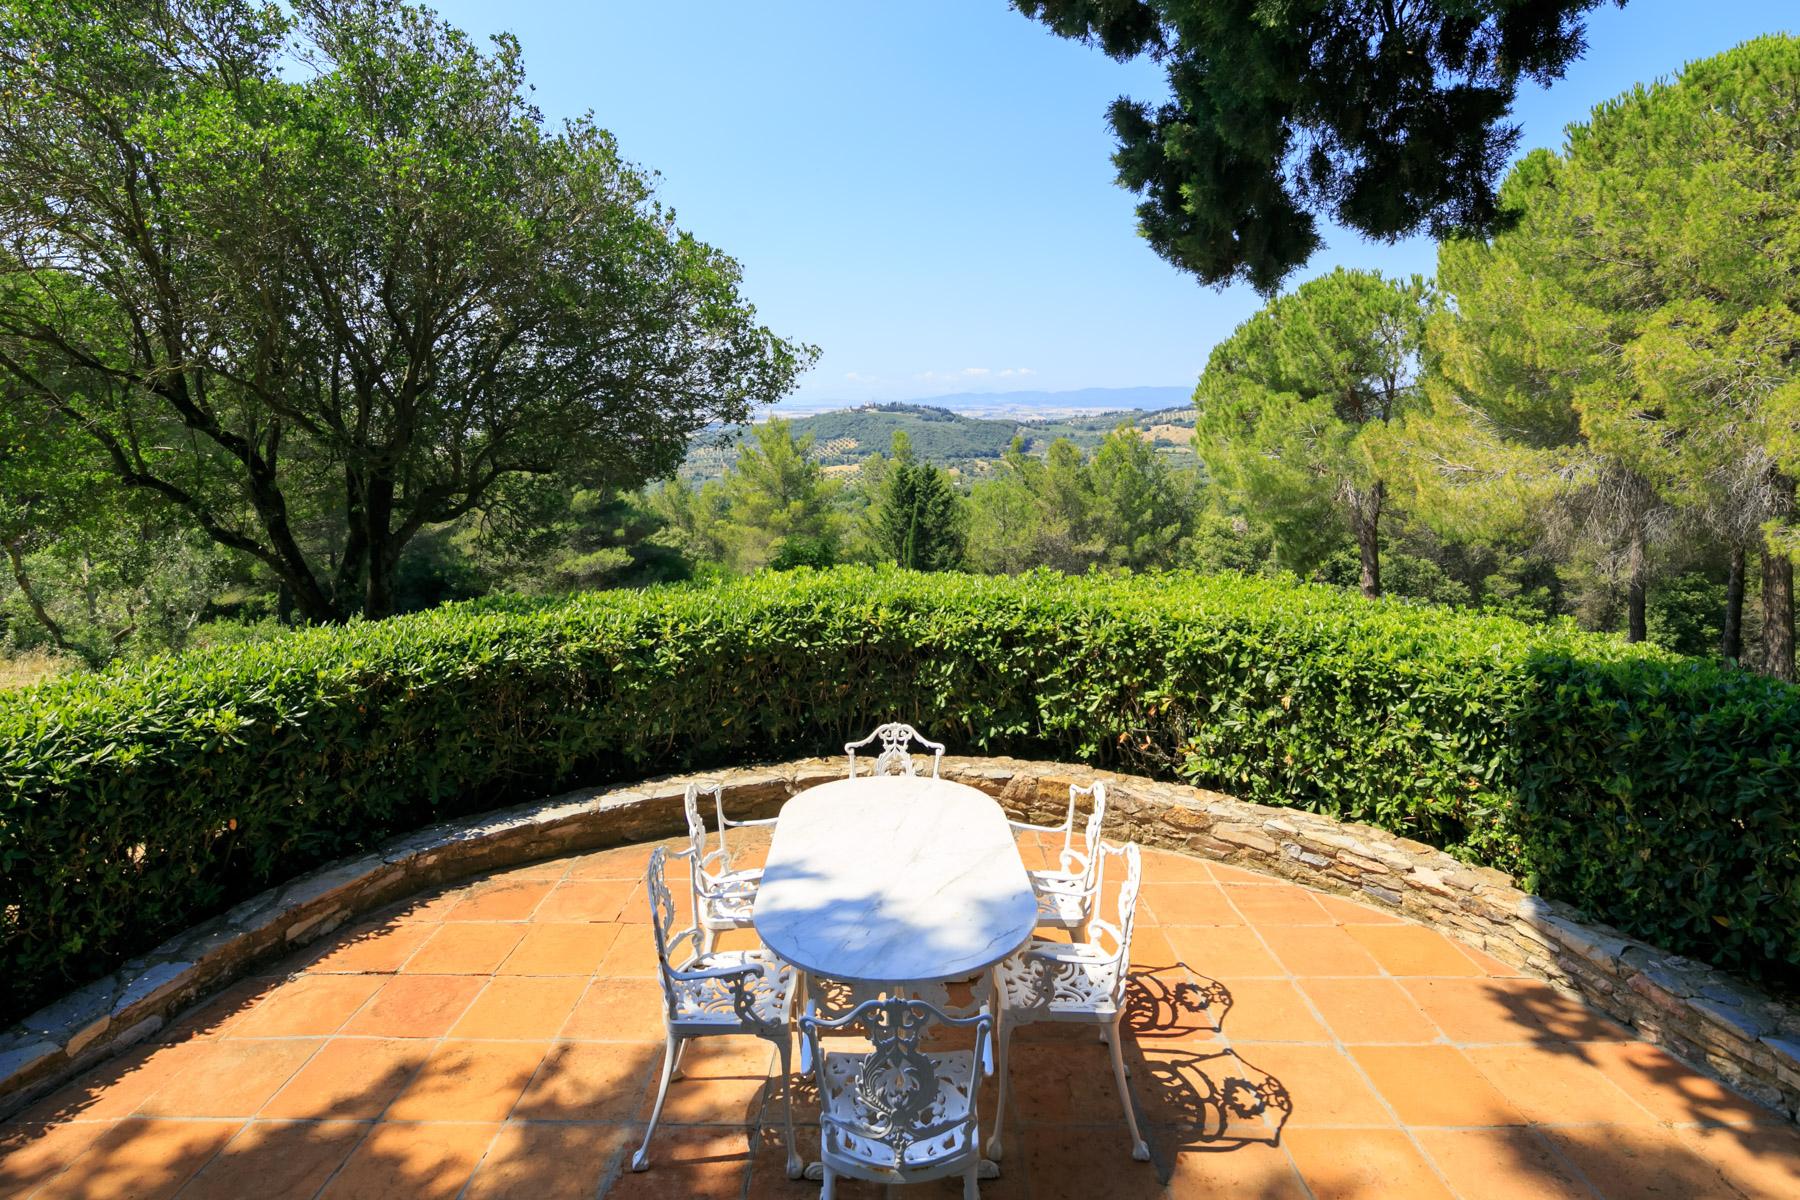 Villa in Vendita a Campiglia Marittima: 5 locali, 1100 mq - Foto 7